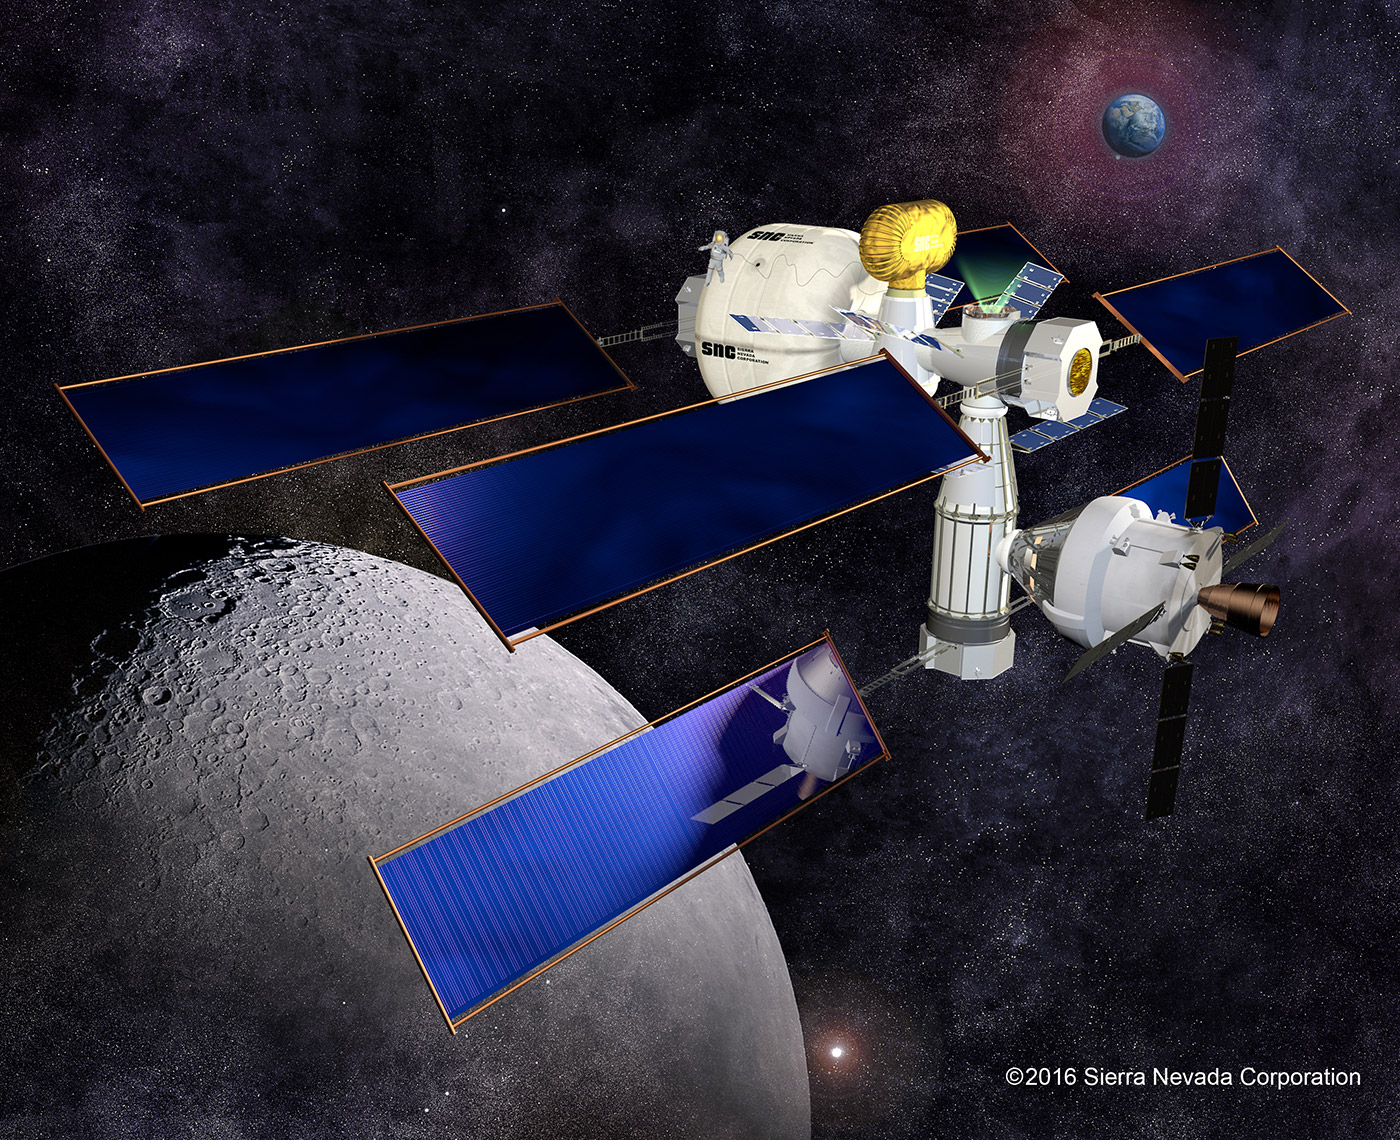 astronaut space habitat - photo #17